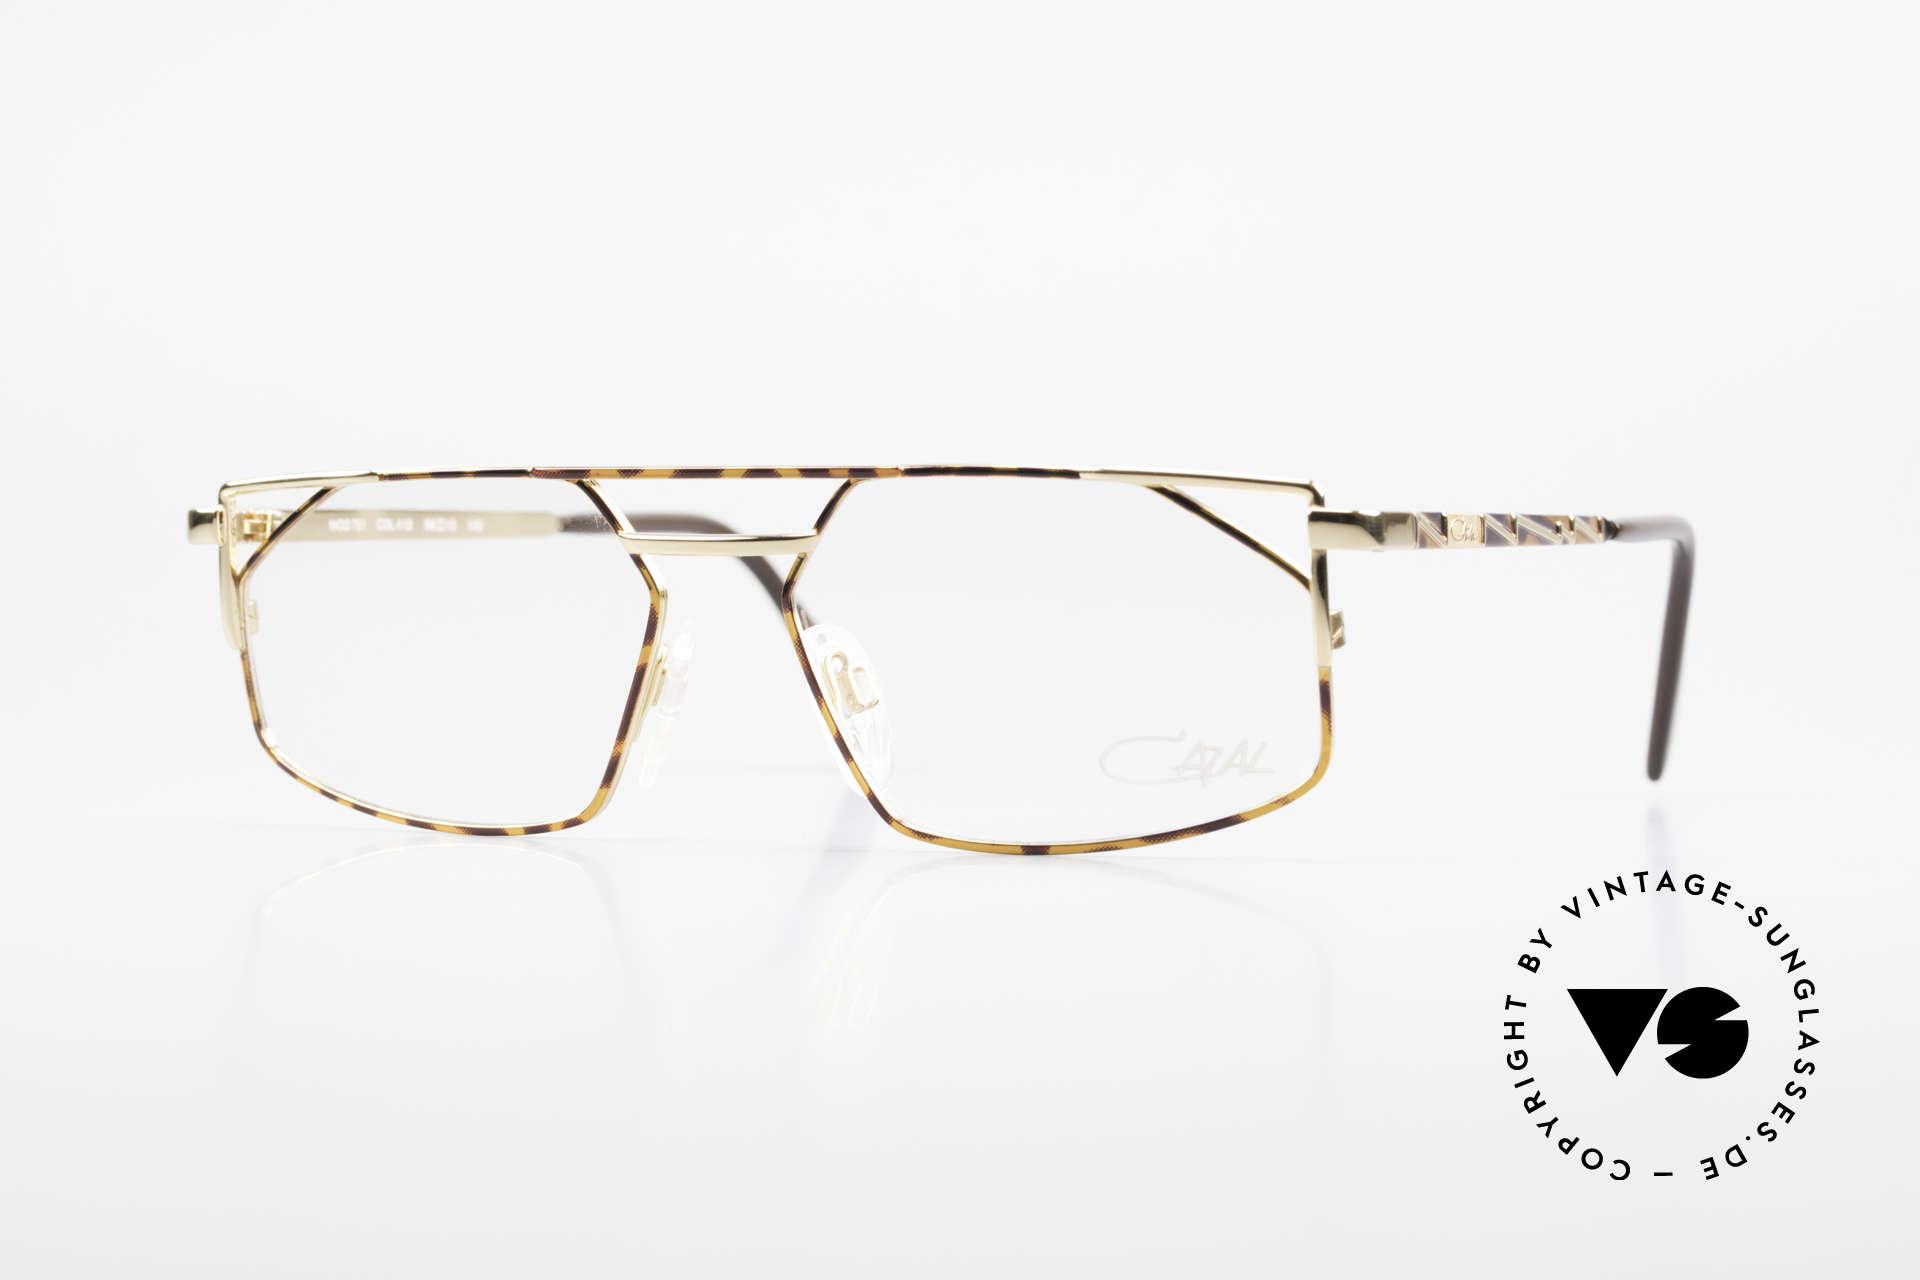 Cazal 751 90's Designer Eyeglasses, angled metal designer frame with high-grade finish, Made for Men